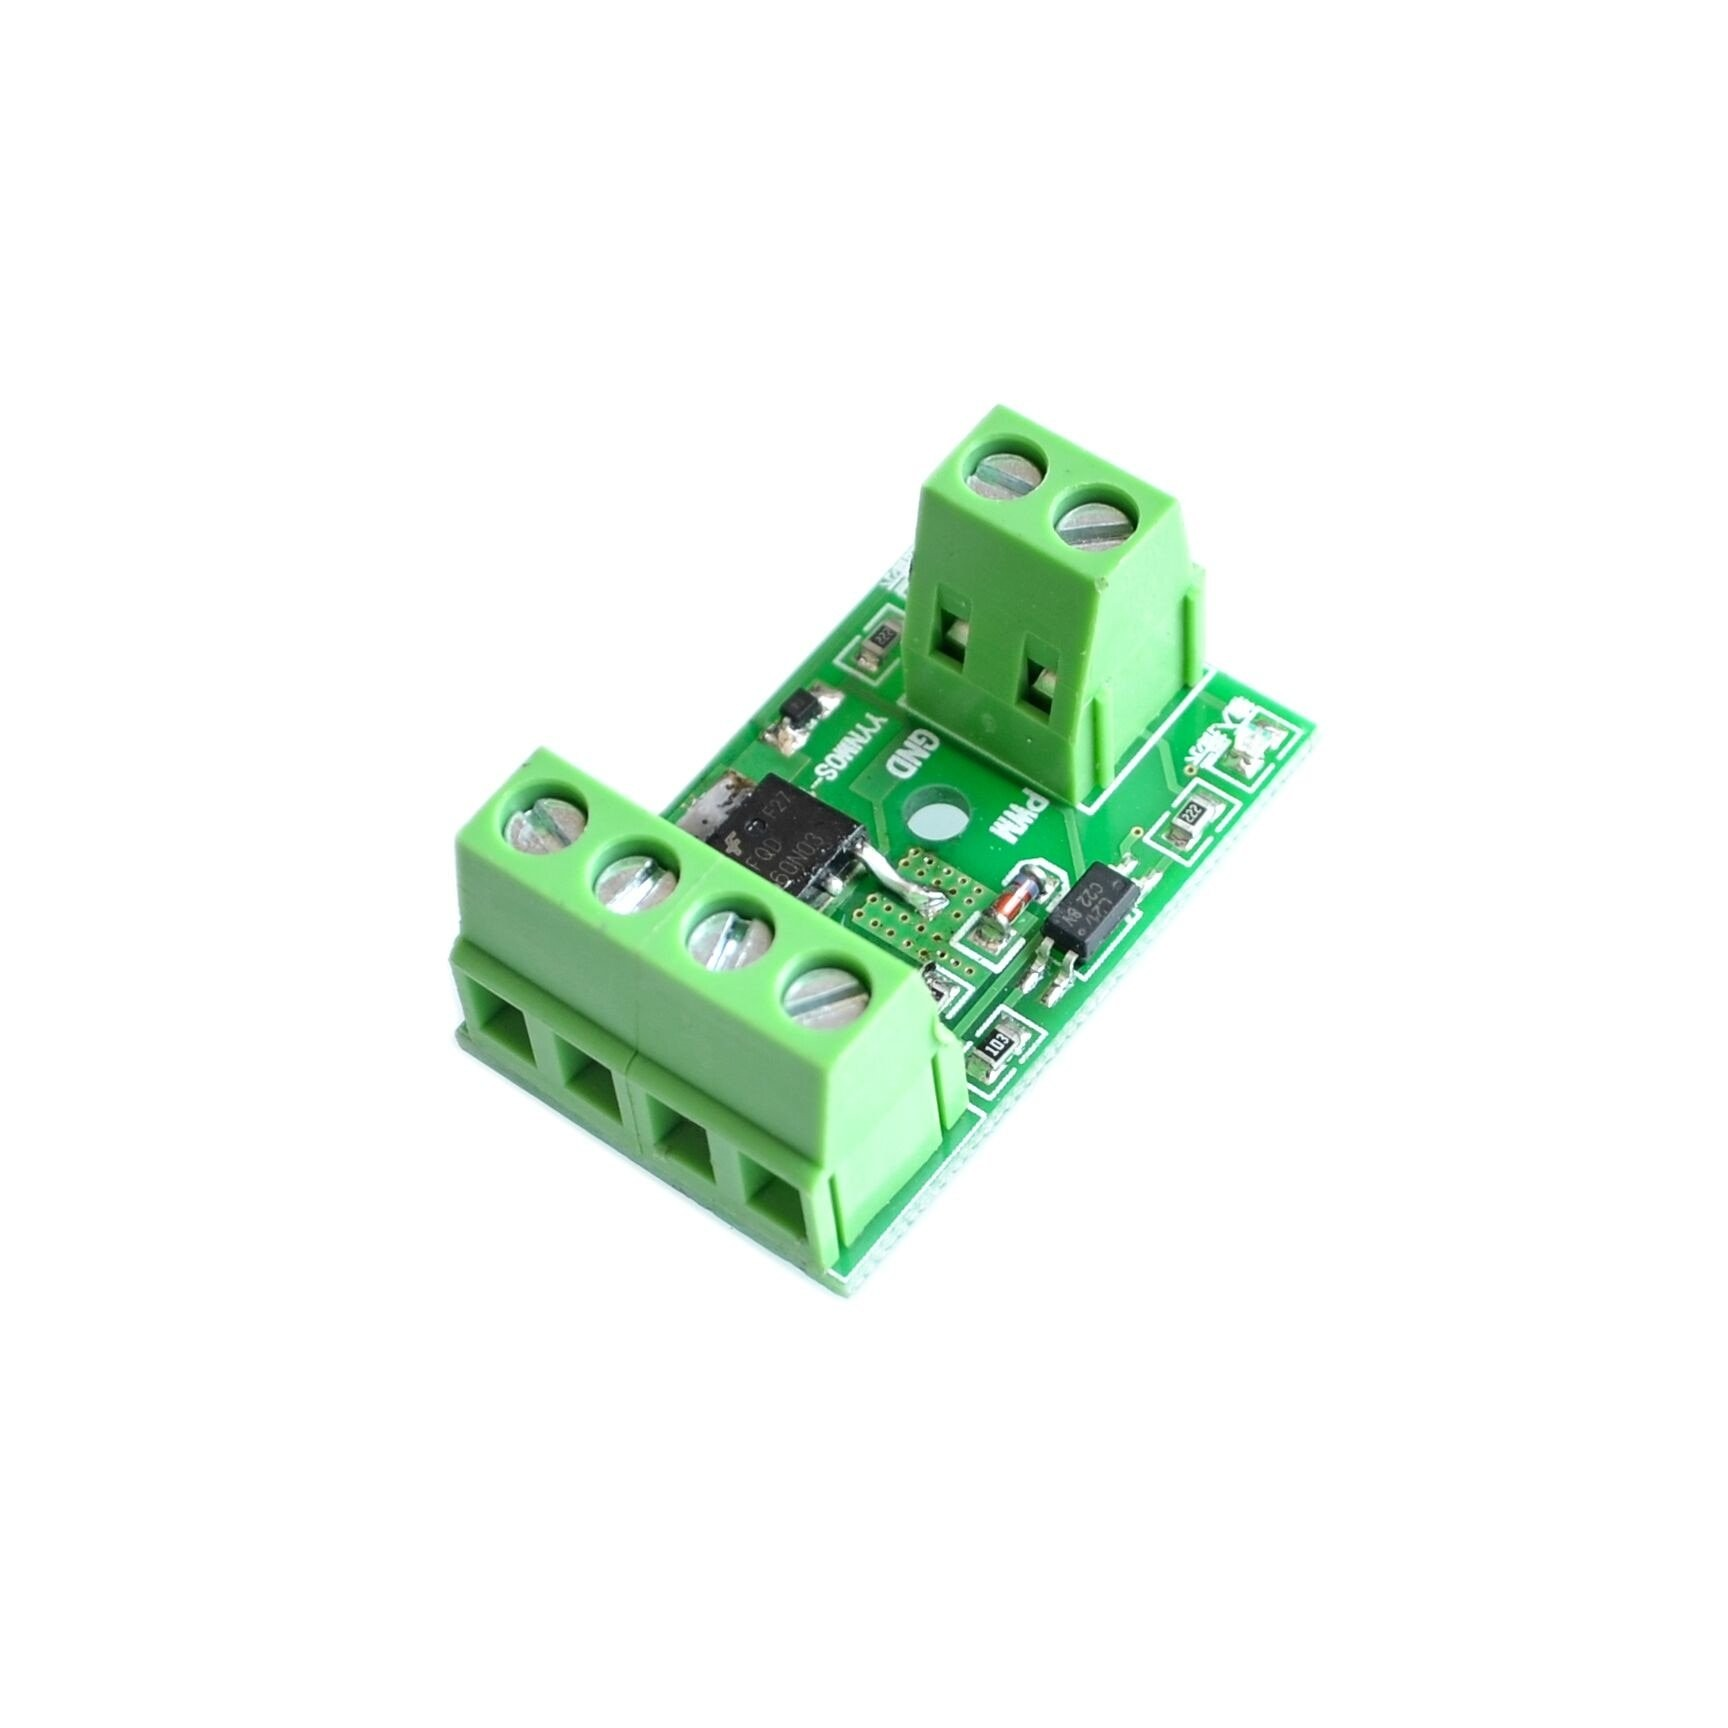 Thx203h New 1 Bit Ac 220v Optocoupler isolation Module Voltage Detect Board Unique Thx203h